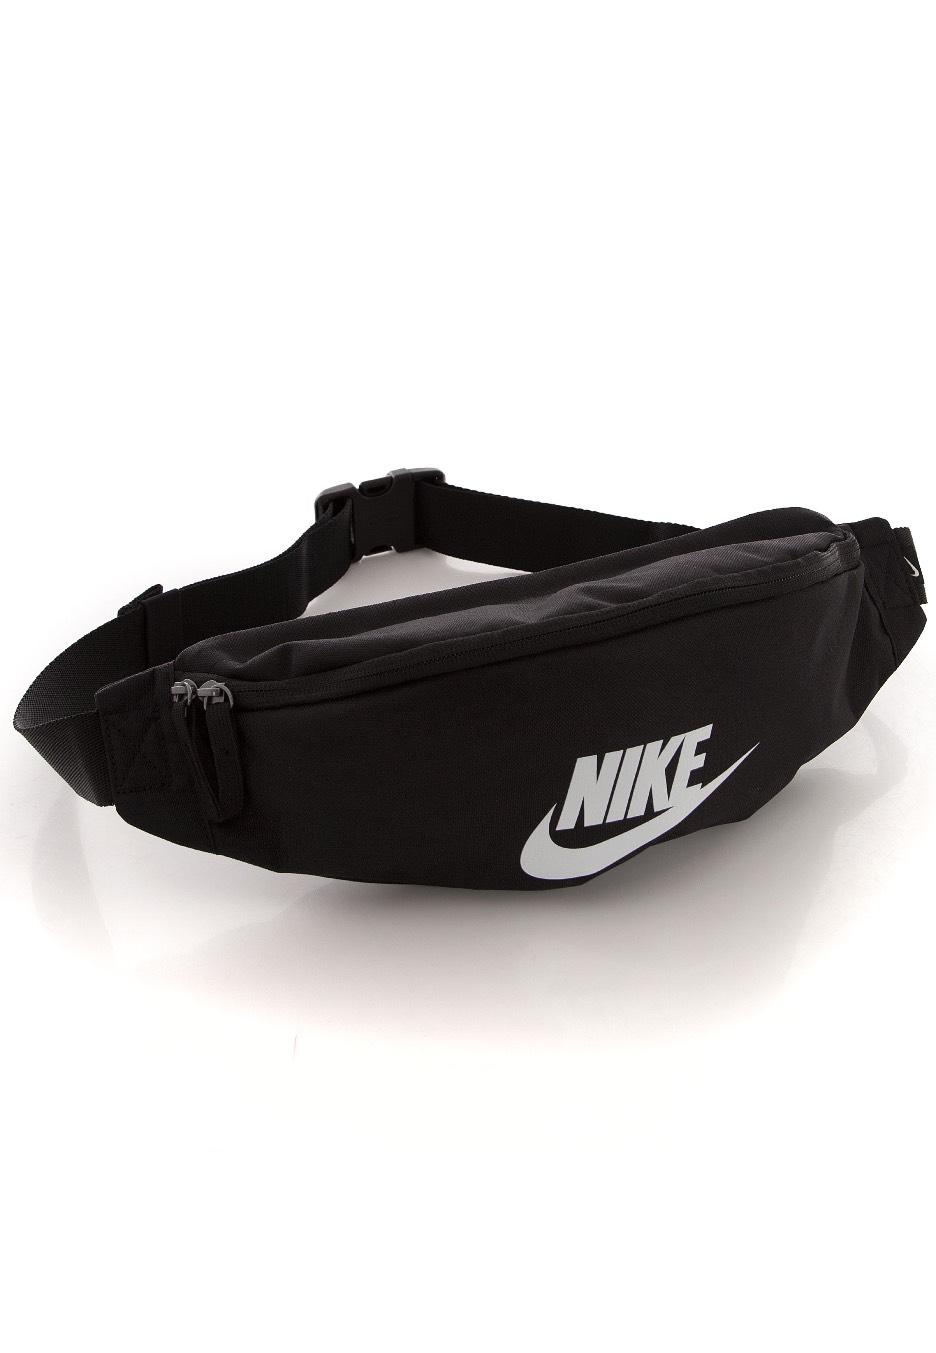 8bd6bd86d3 Nike - Heritage Black Black White - Hip Bag - Streetwear Shop -  Impericon.com Worldwide